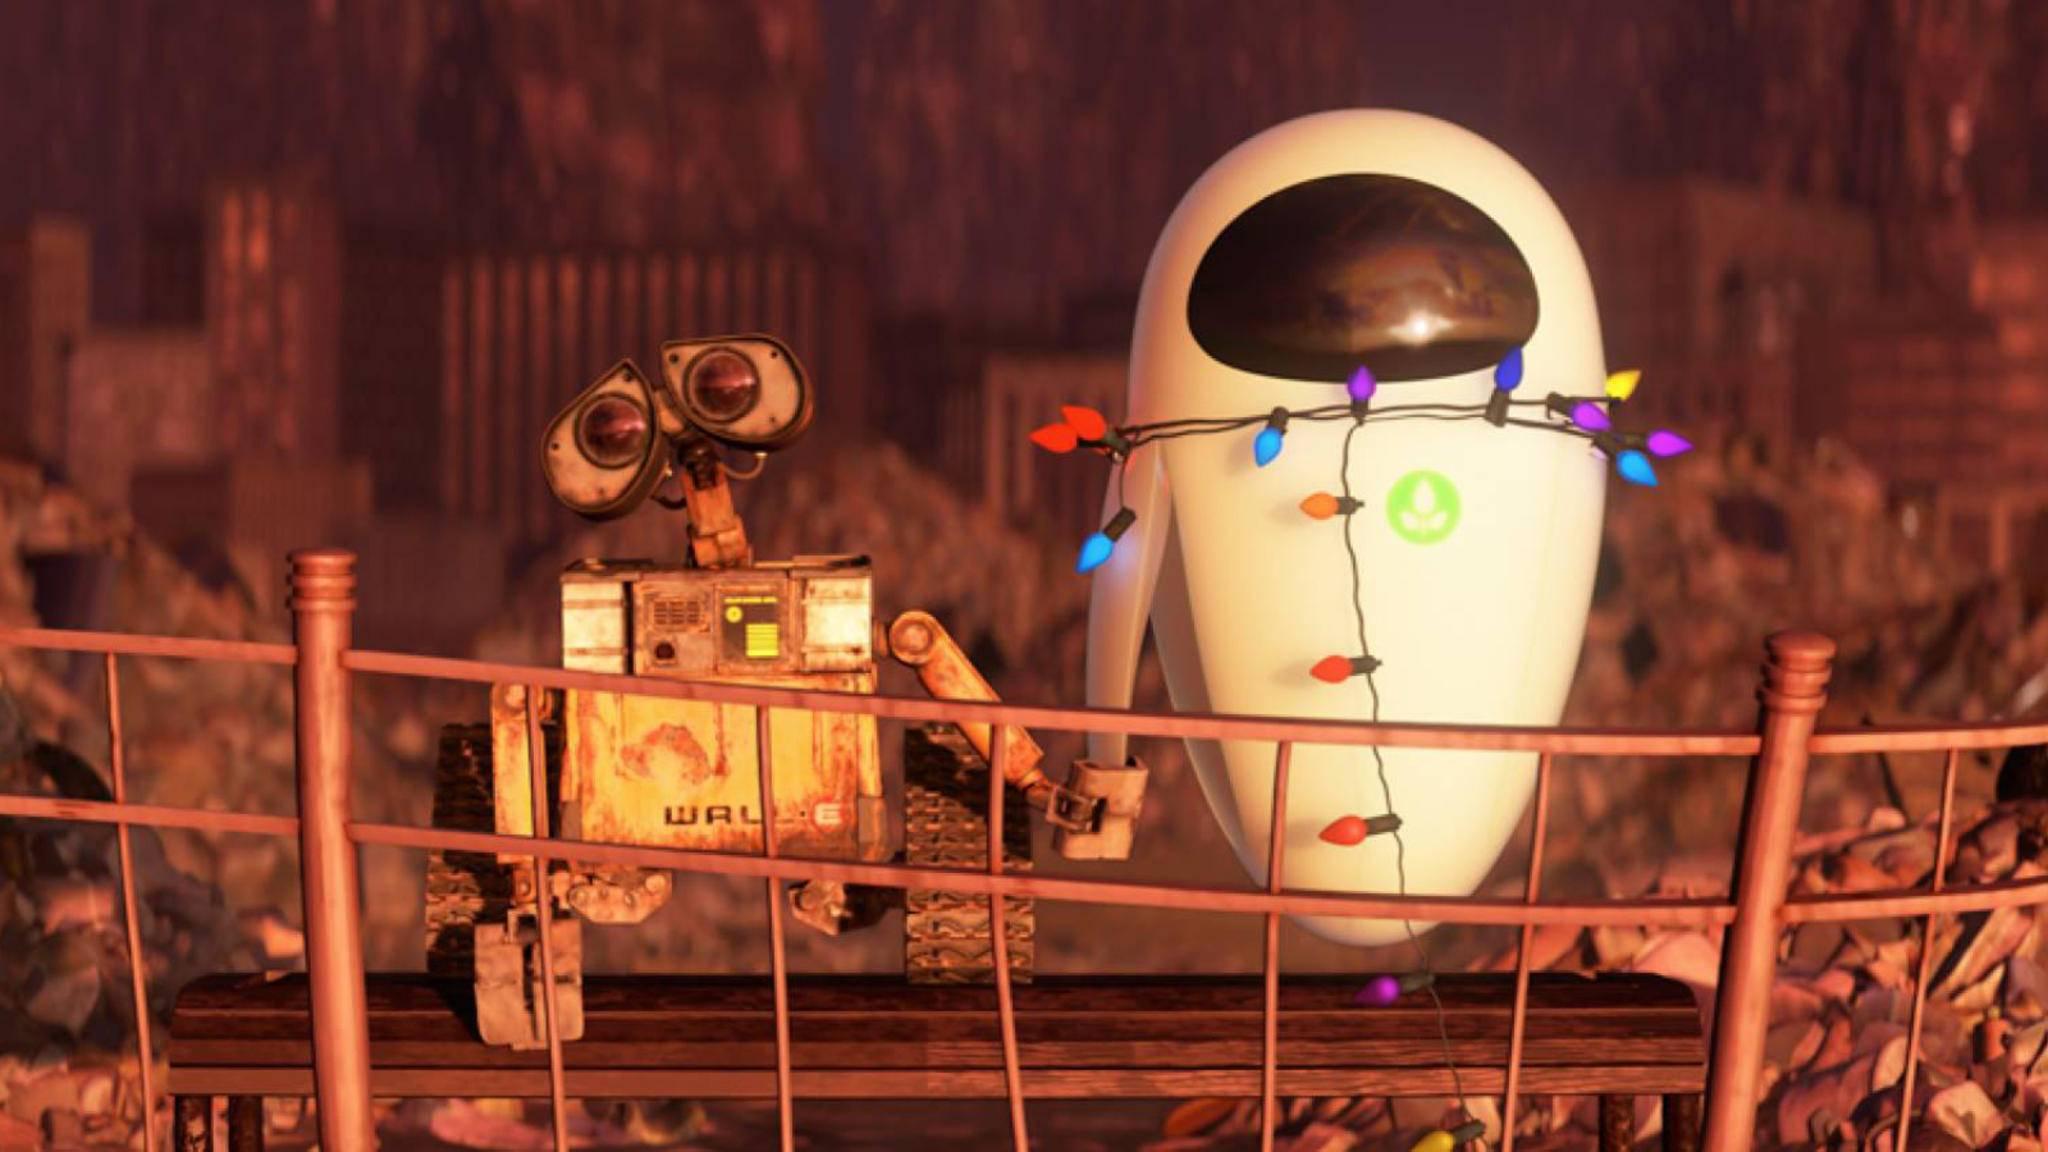 wall-e disney pixar